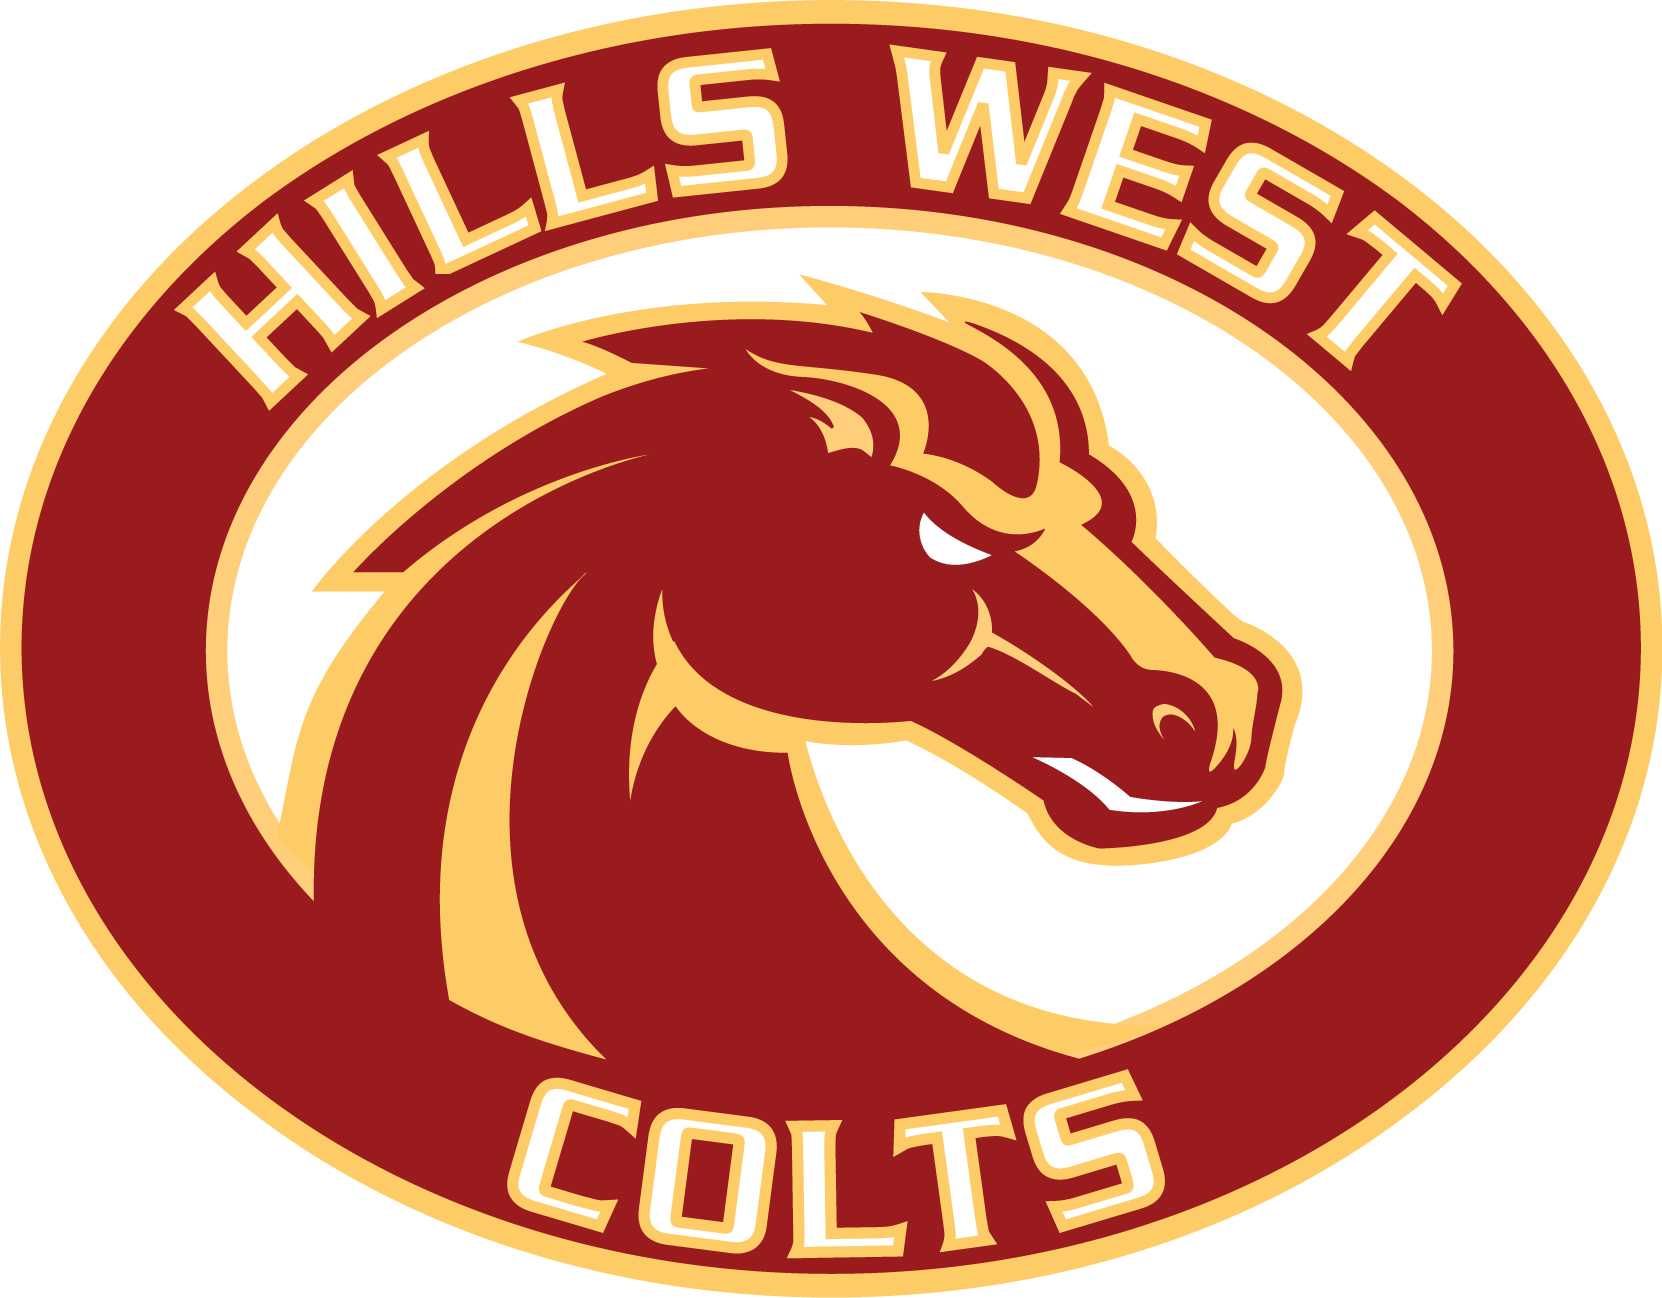 Half Hollow Hills West